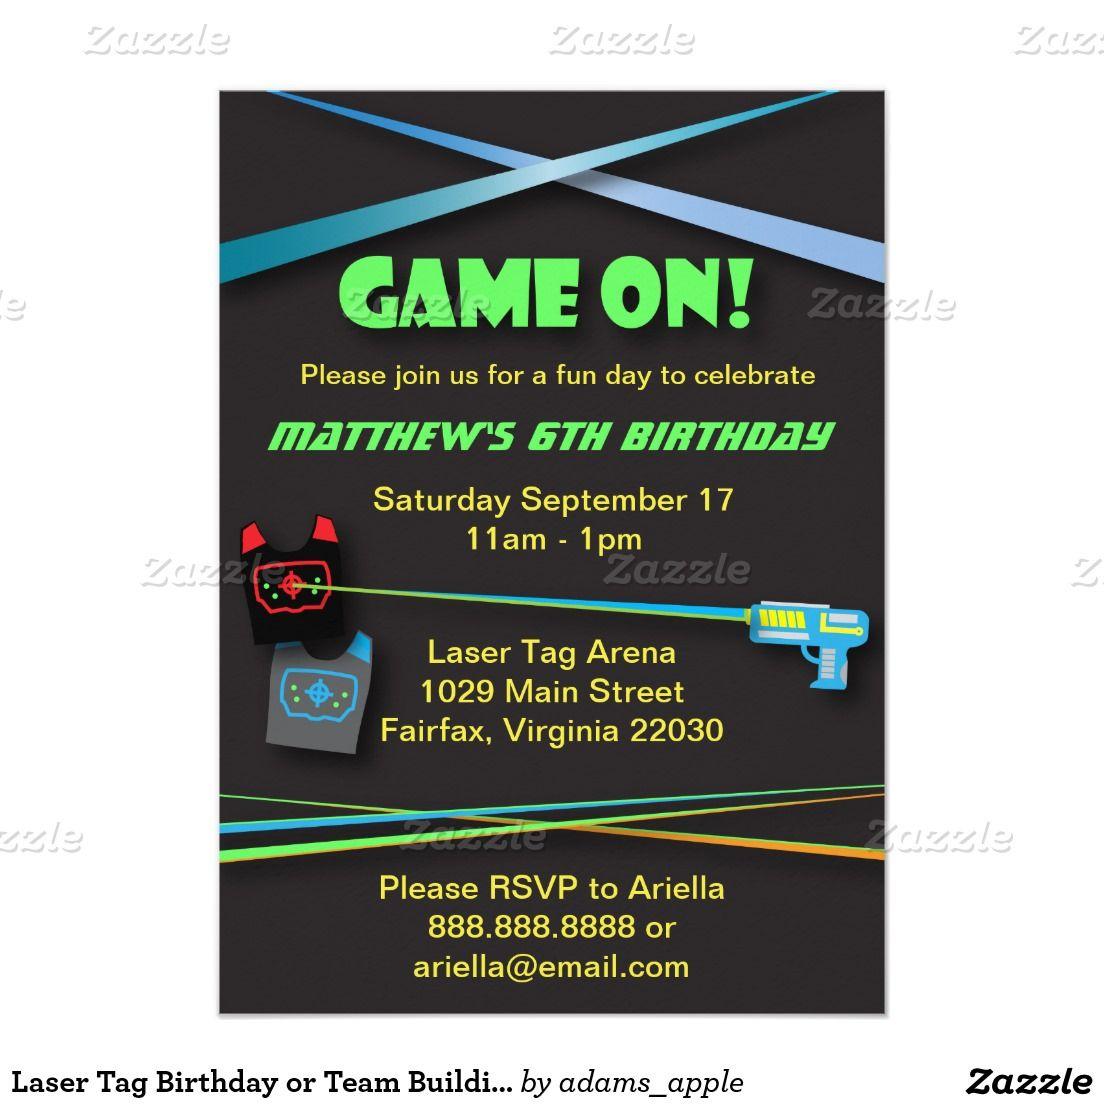 Laser Tag Birthday or Team Building Party Card Laser tag birthday